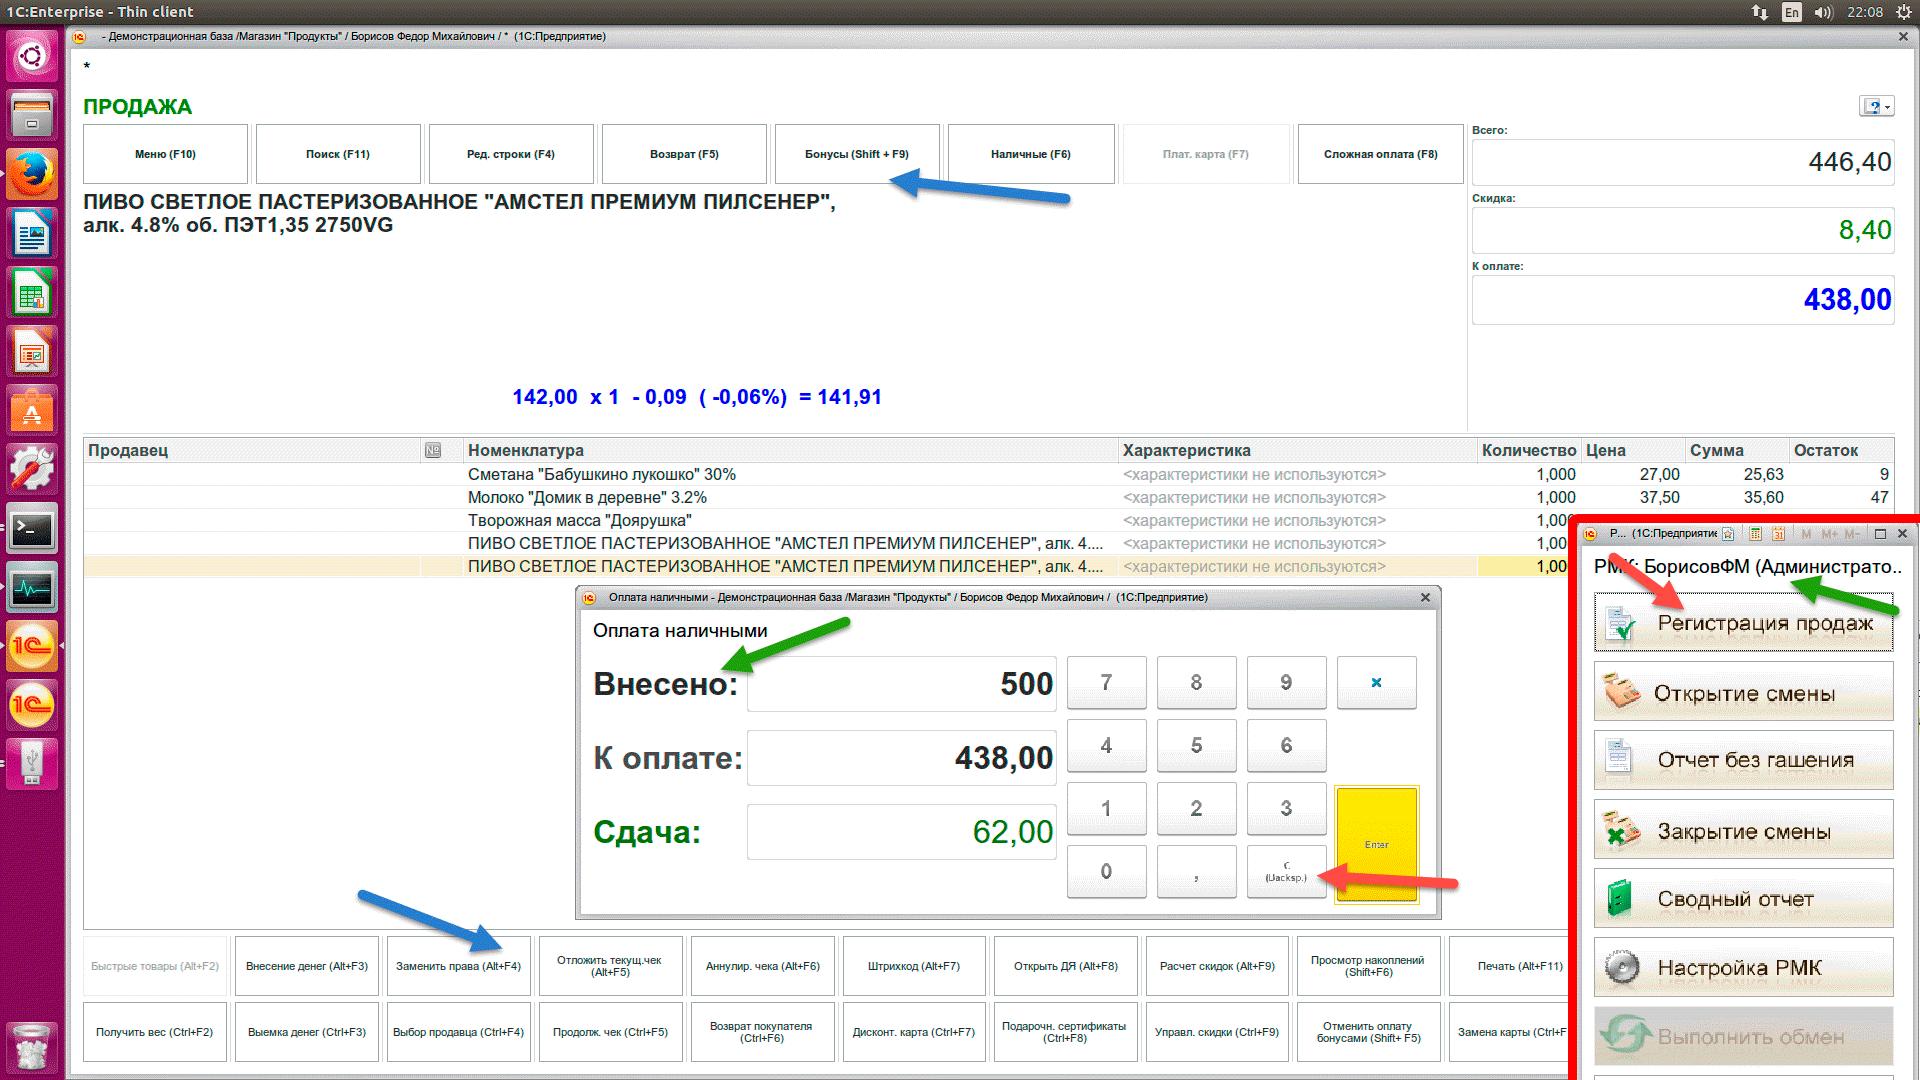 https://interface31.ru/tech_it/images/tradeware-linux-troubles-009.png